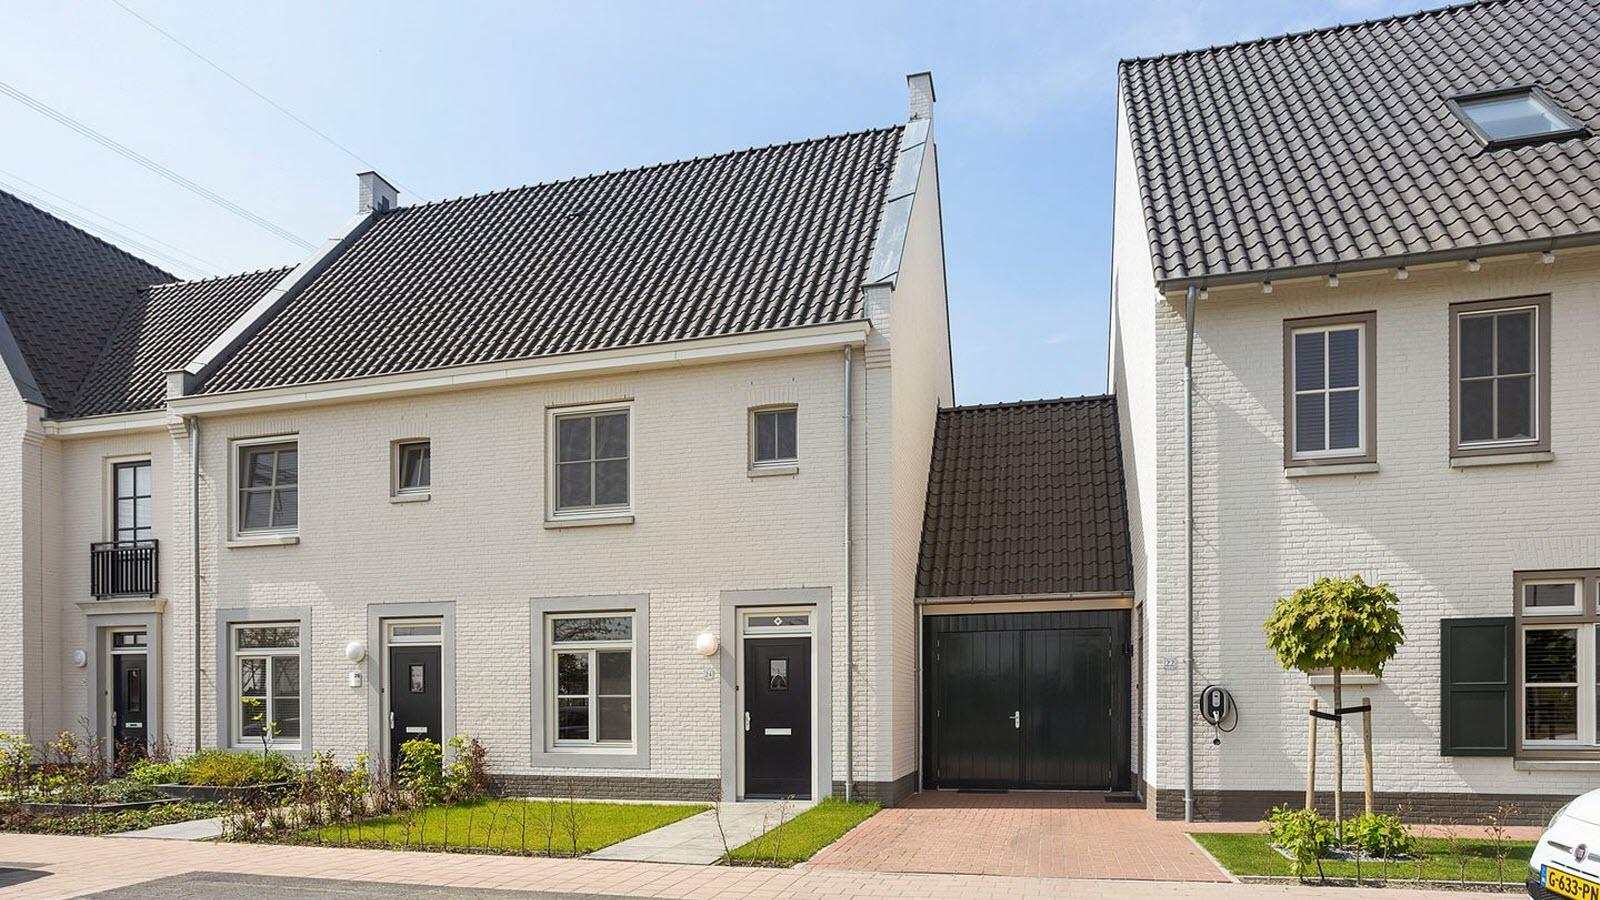 Liverdonk Helmond (2)